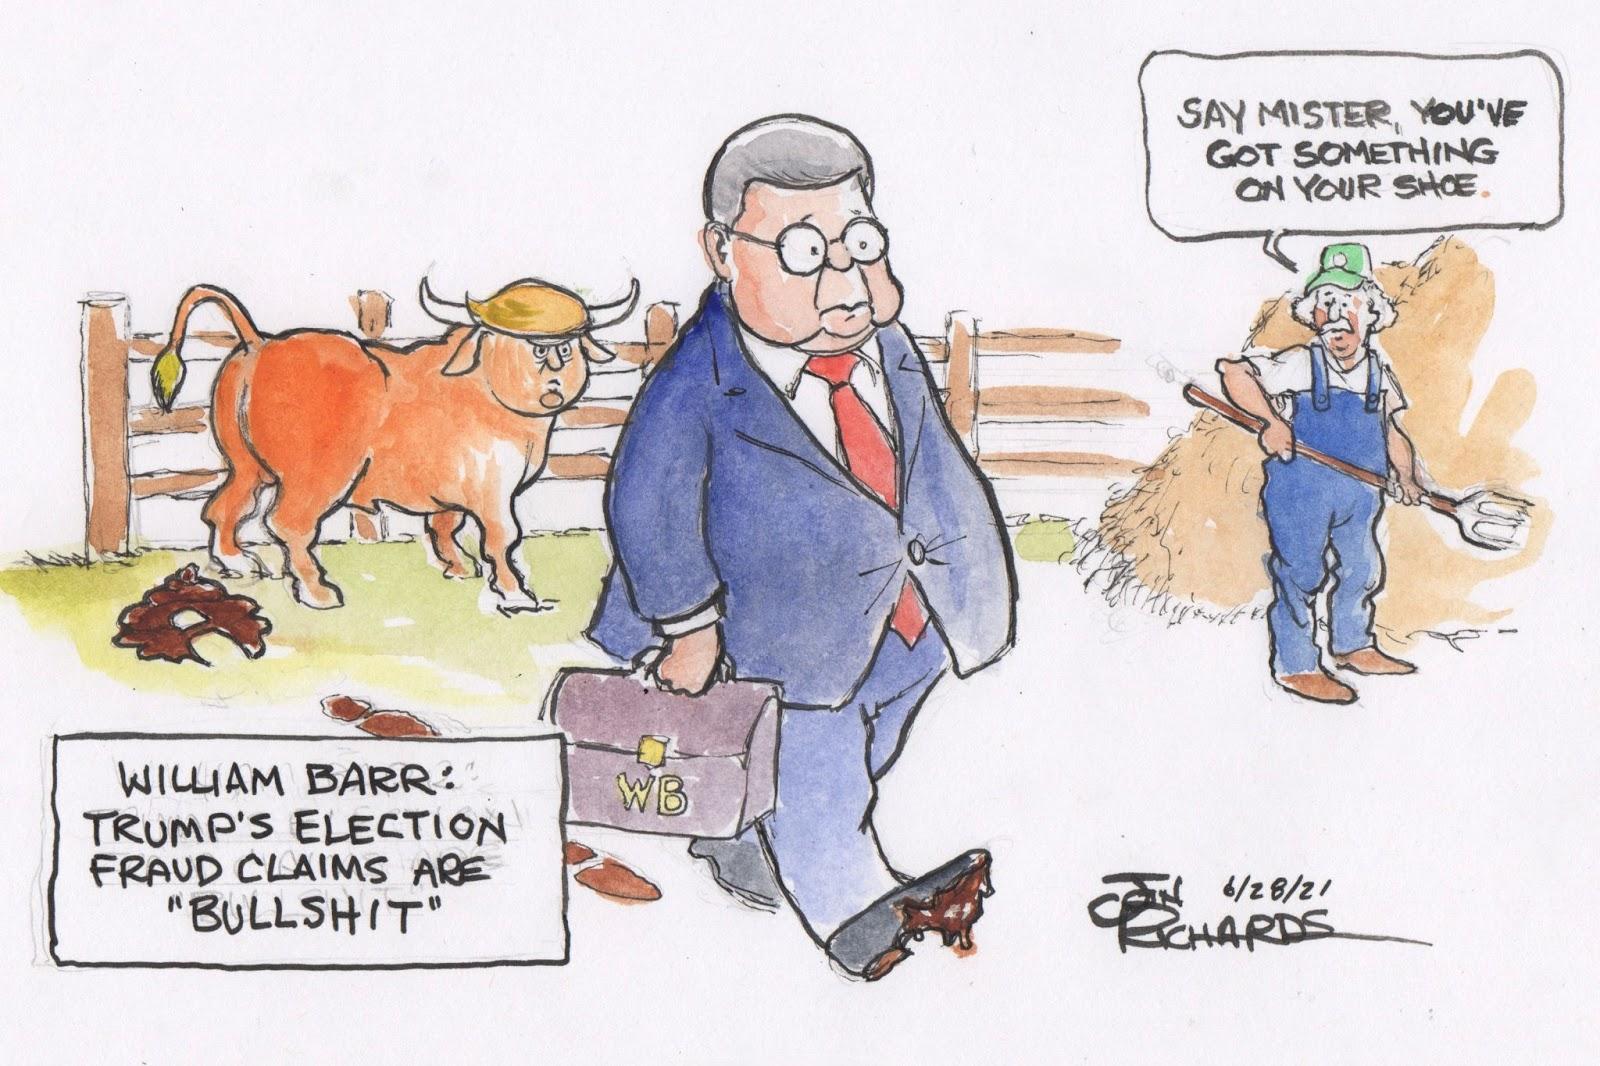 William Barr, Election Fraud, Donald Trump